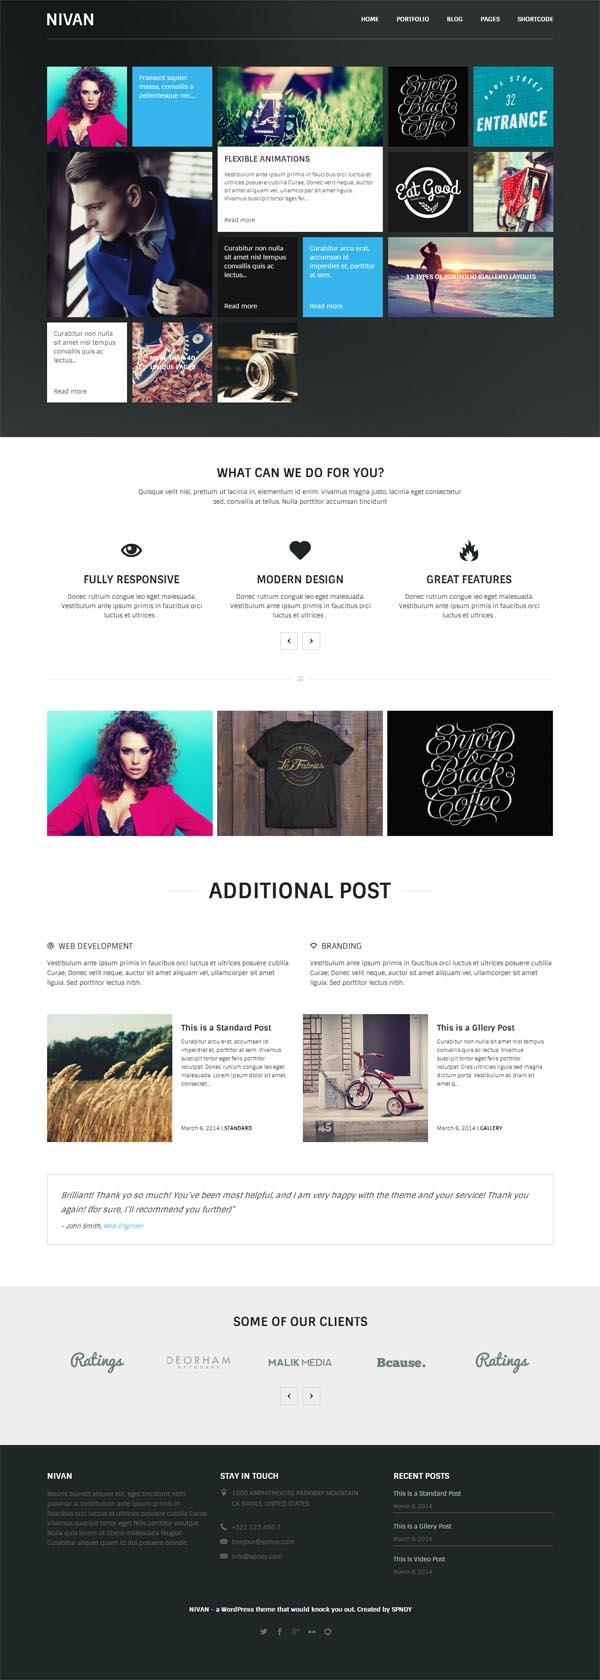 Nivan – One Page/Multi Page WordPress Theme